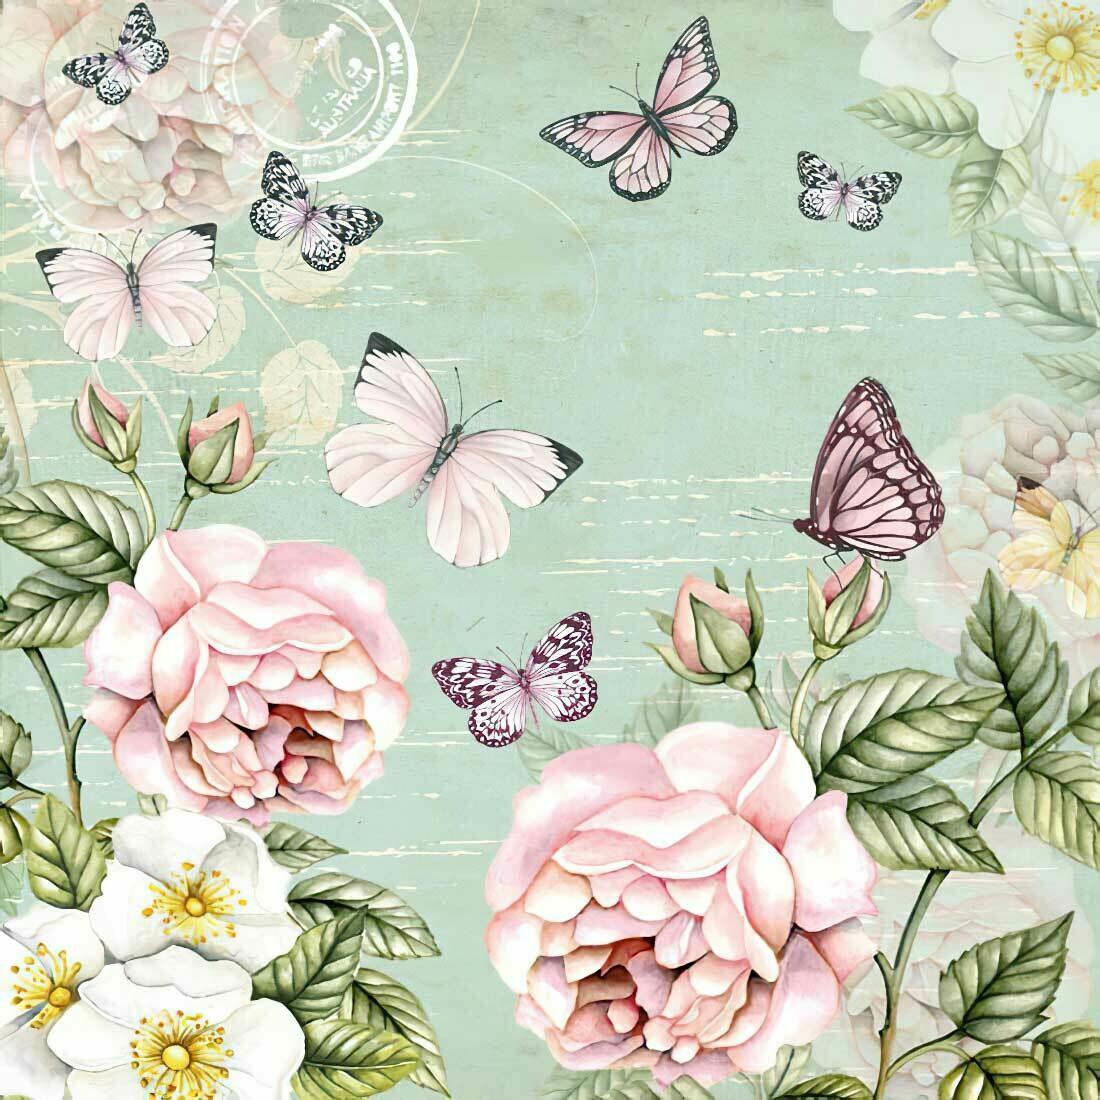 Decoupage Paper Napkins - Floral -Botanical Green with Butterflies 13x13 (1 Sheet)